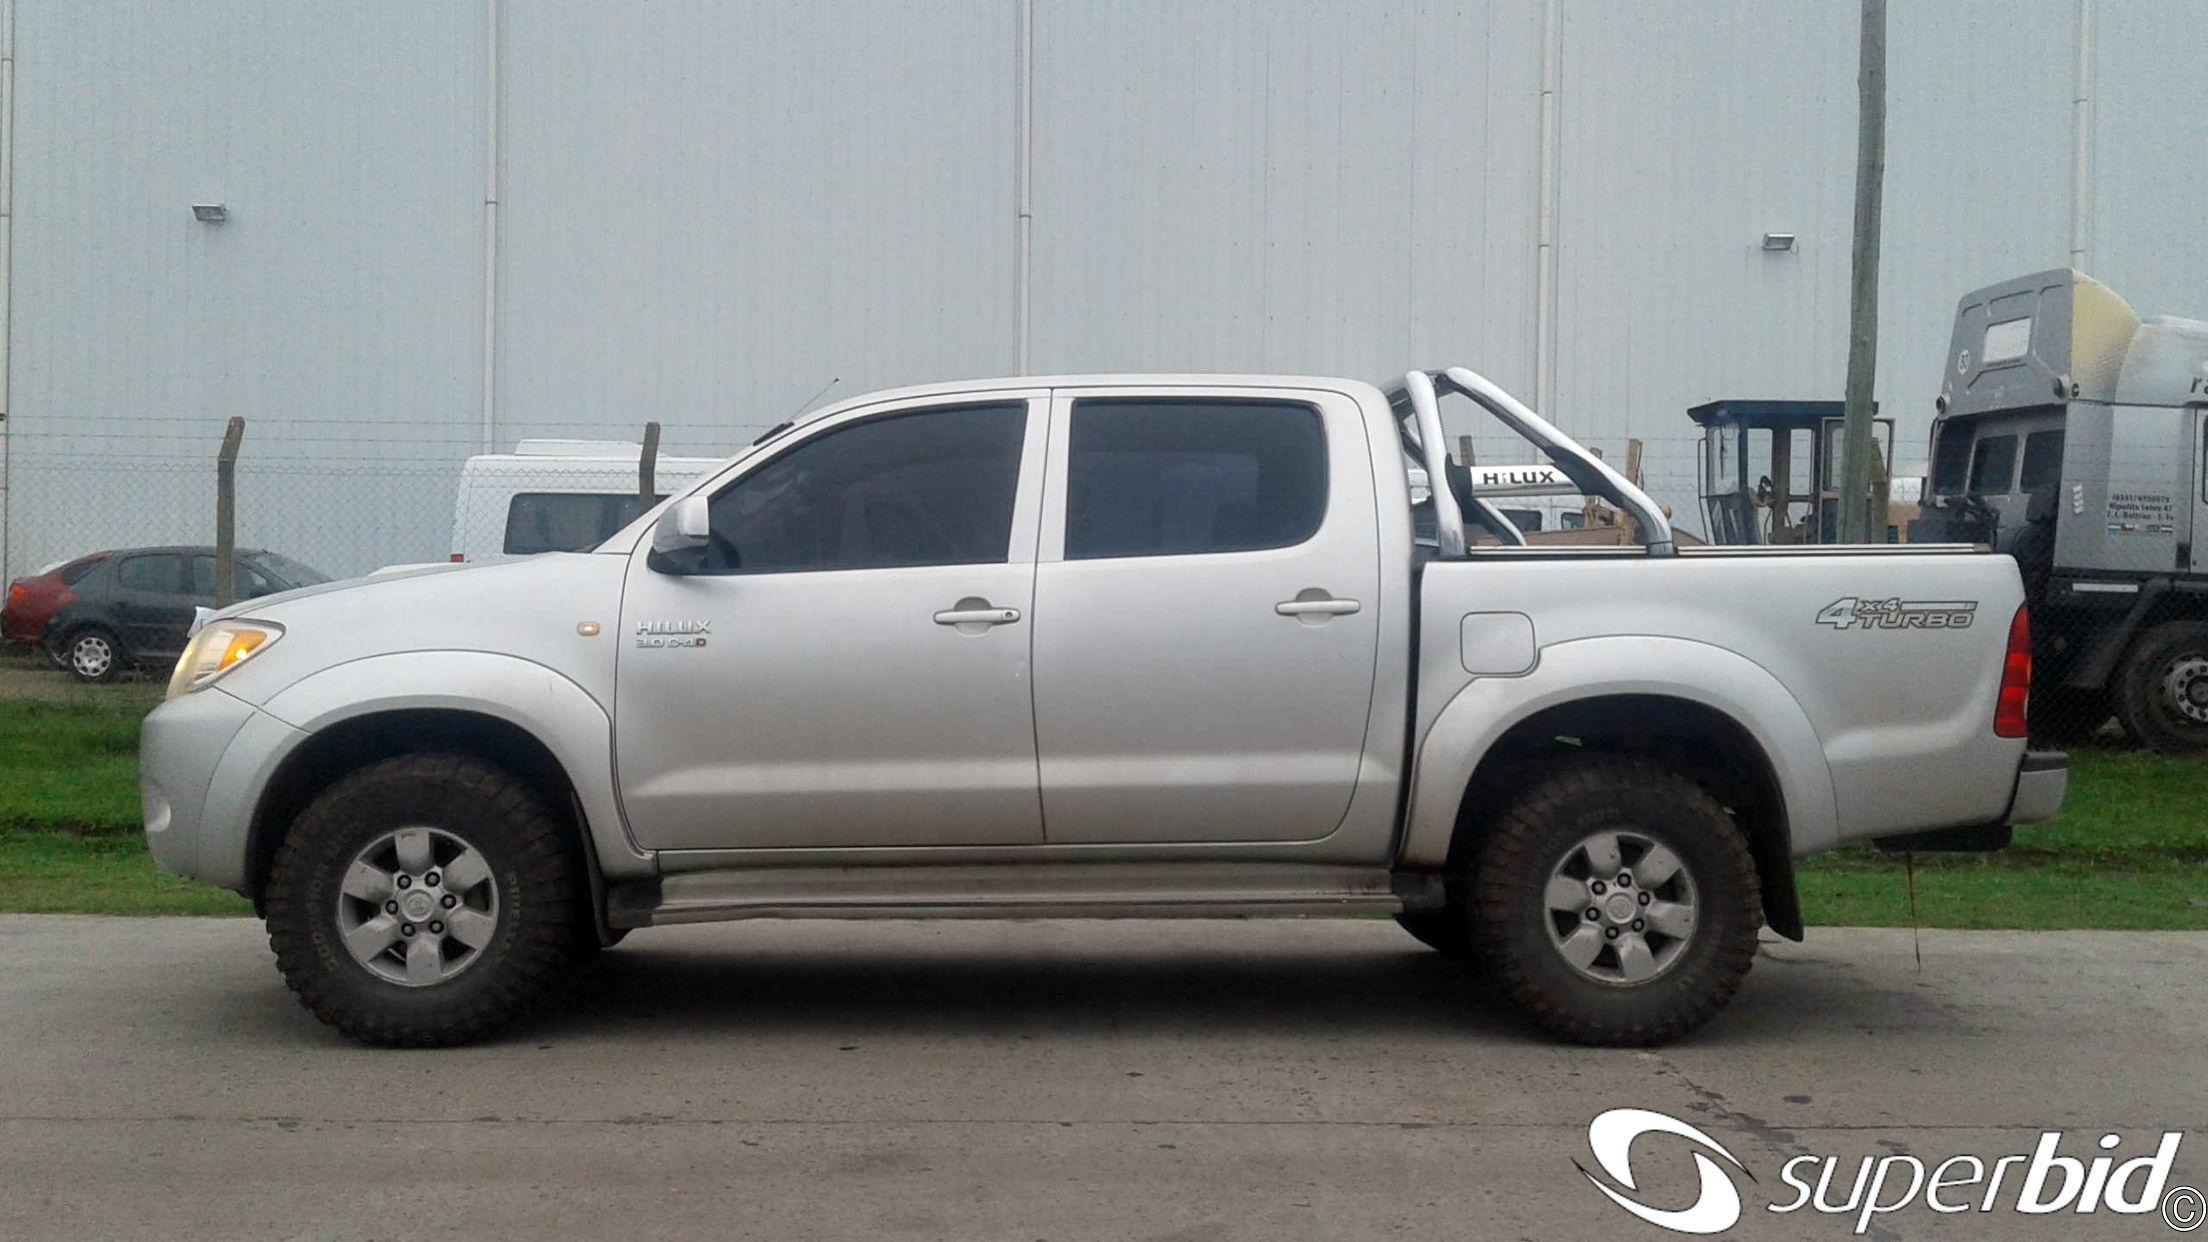 Subasta Detoyota Pick Up Hilux 4x4 Cabina Doble Srv 3 0 Tdi